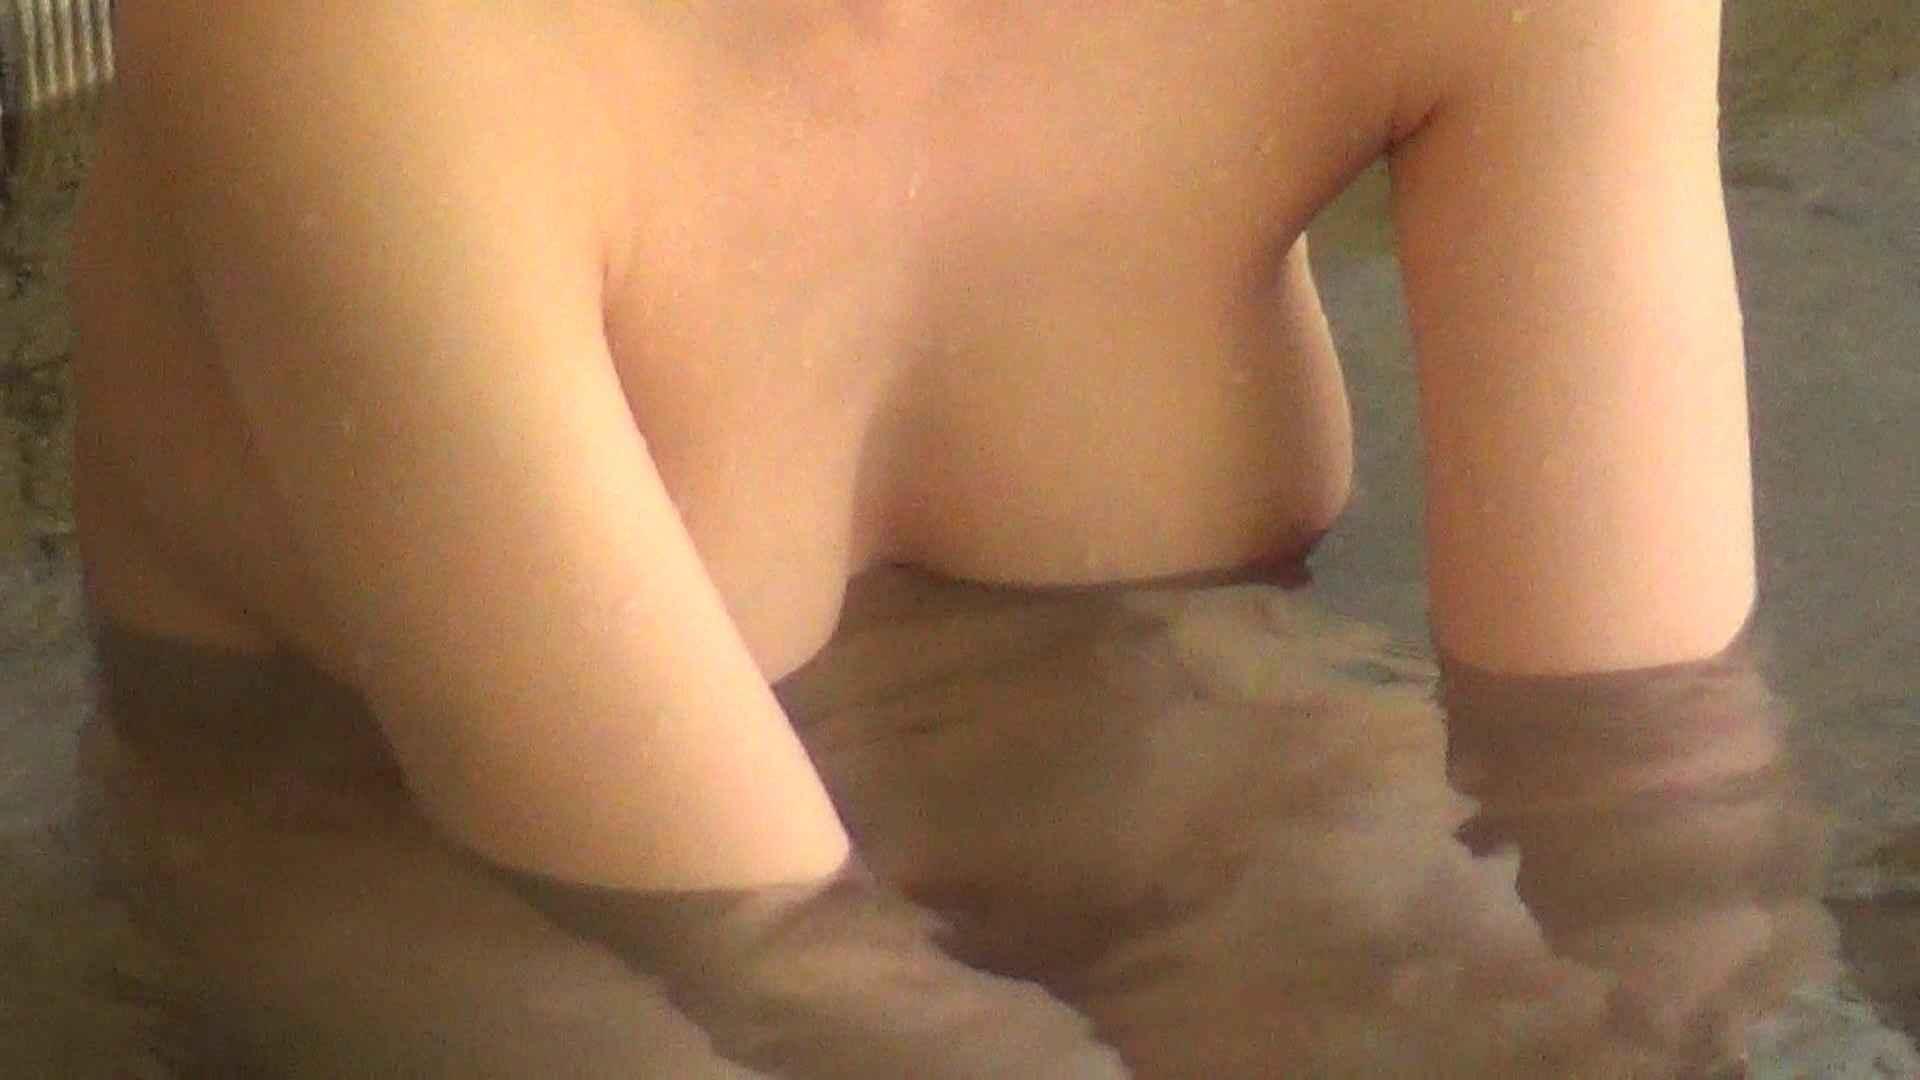 Aquaな露天風呂Vol.248 露天風呂編  97PIX 14